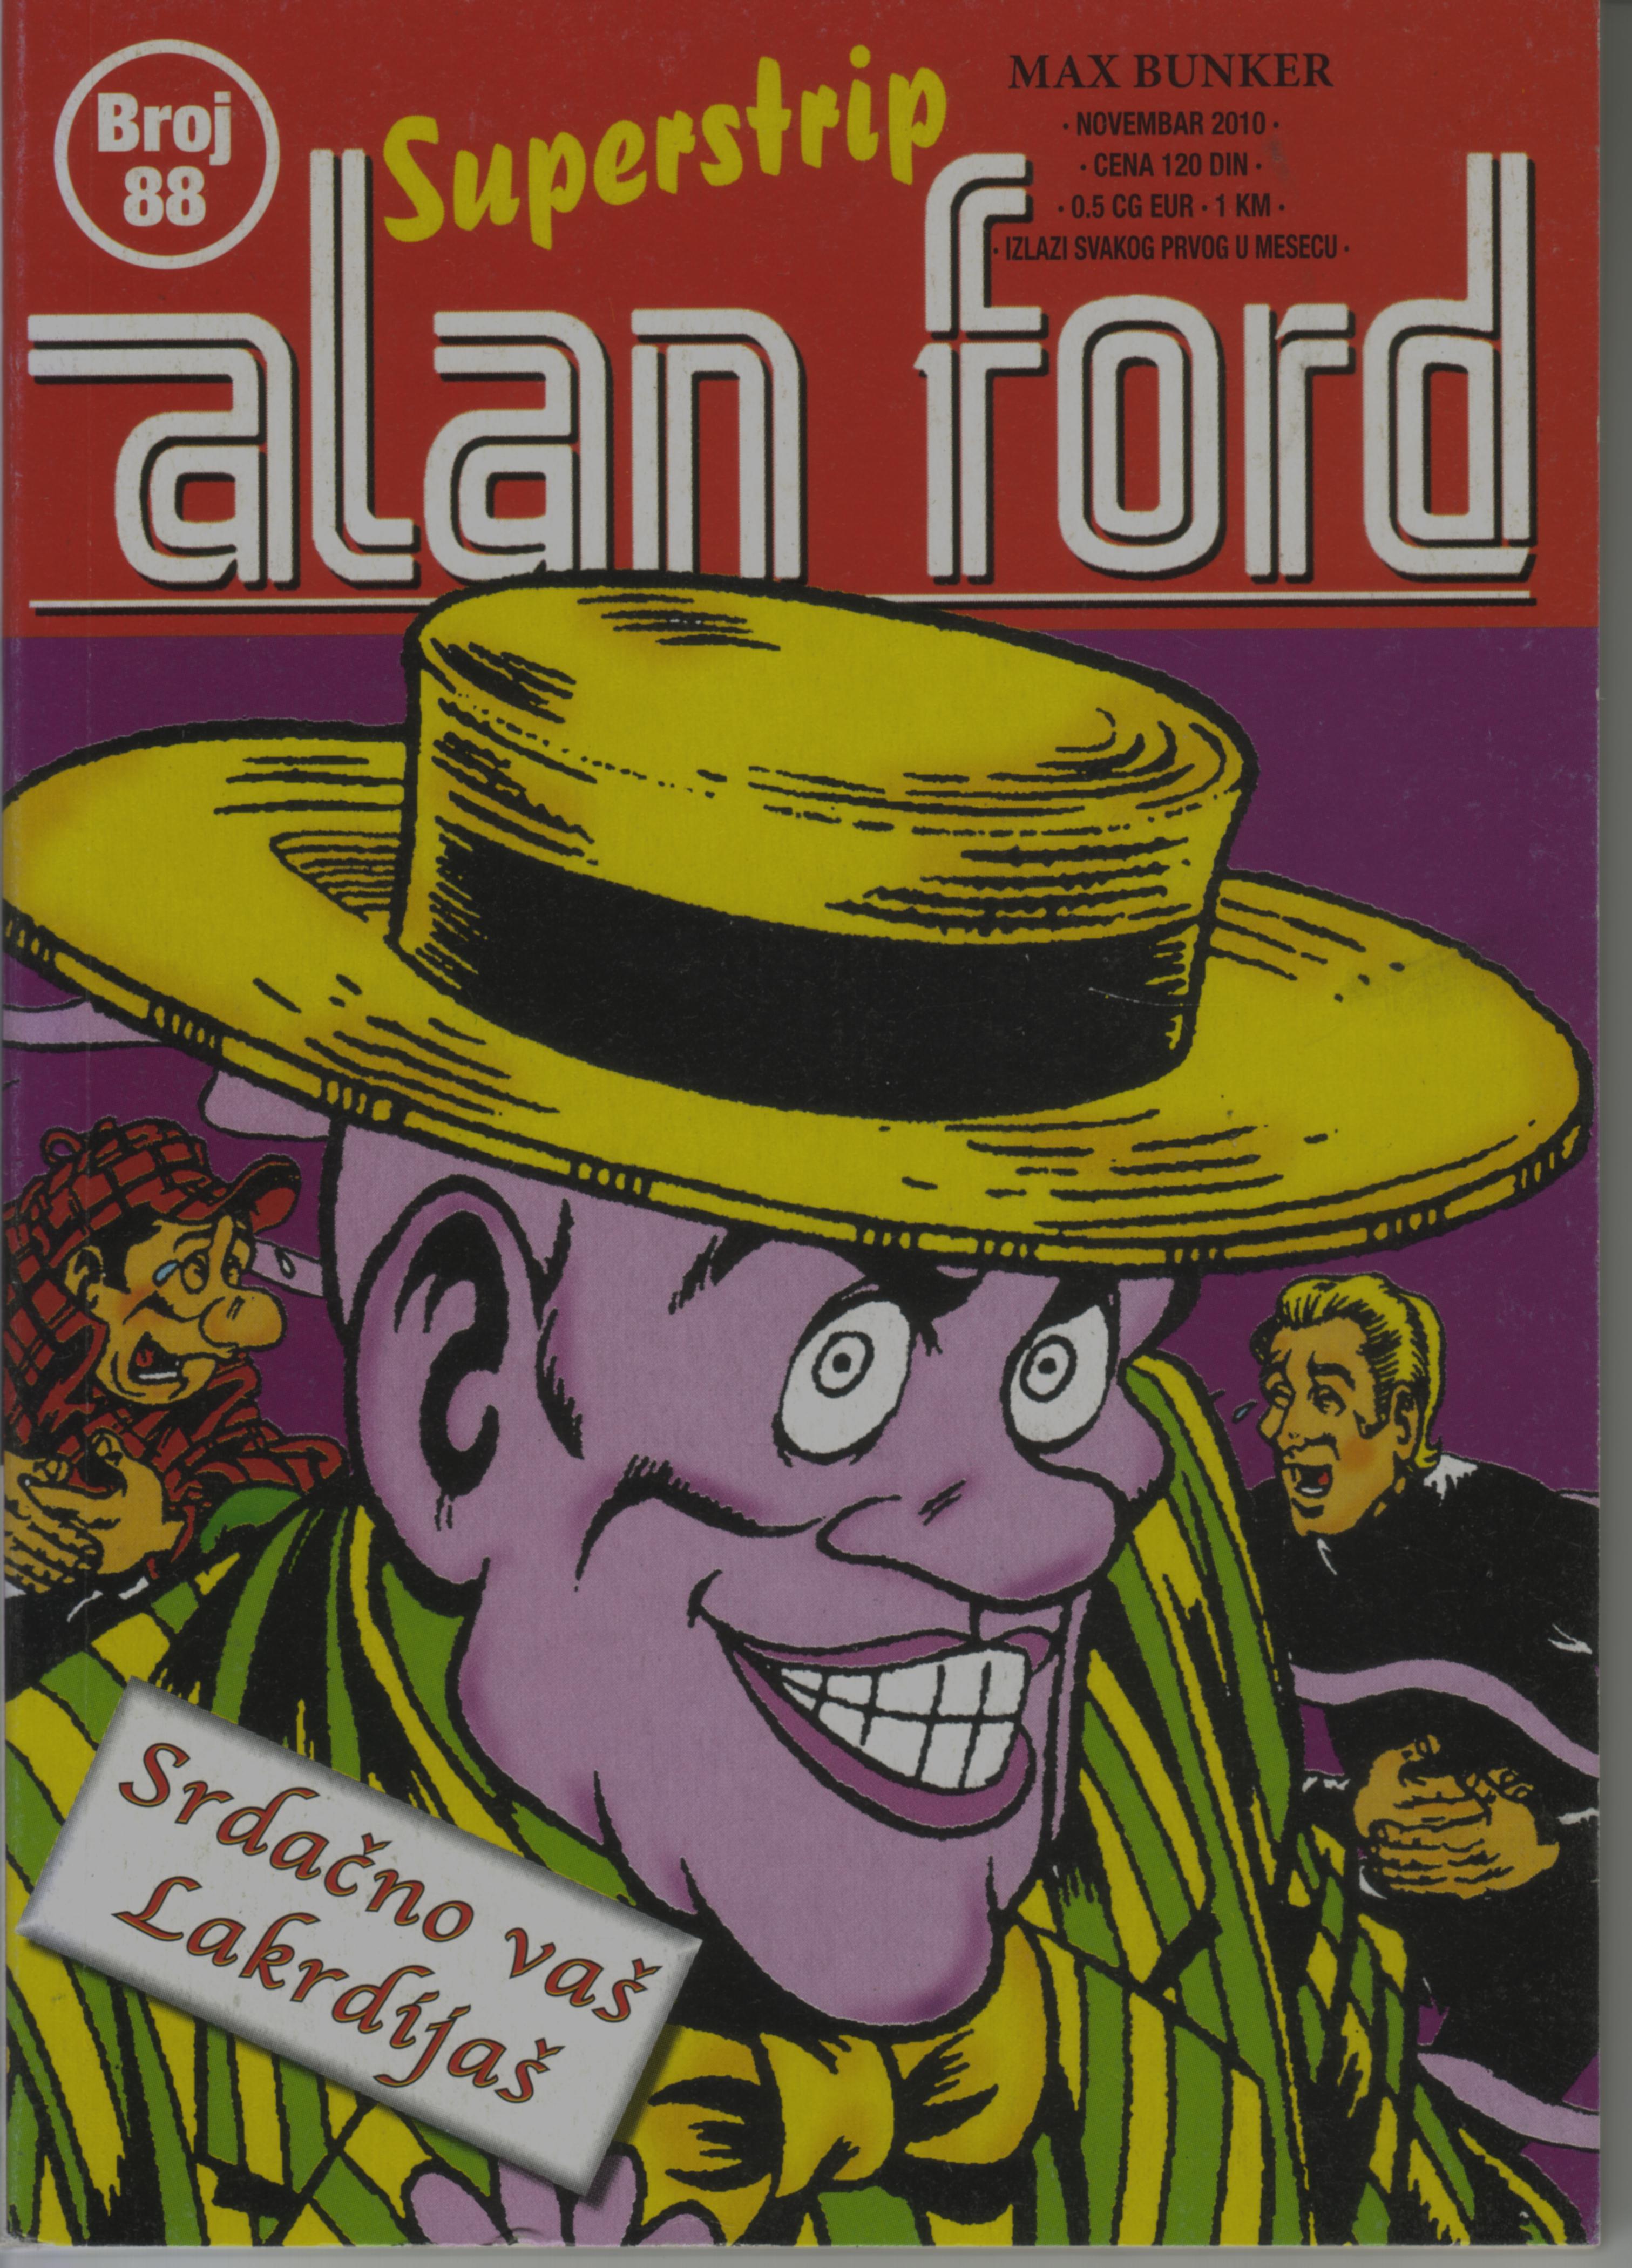 Alan Ford Superstrip #88